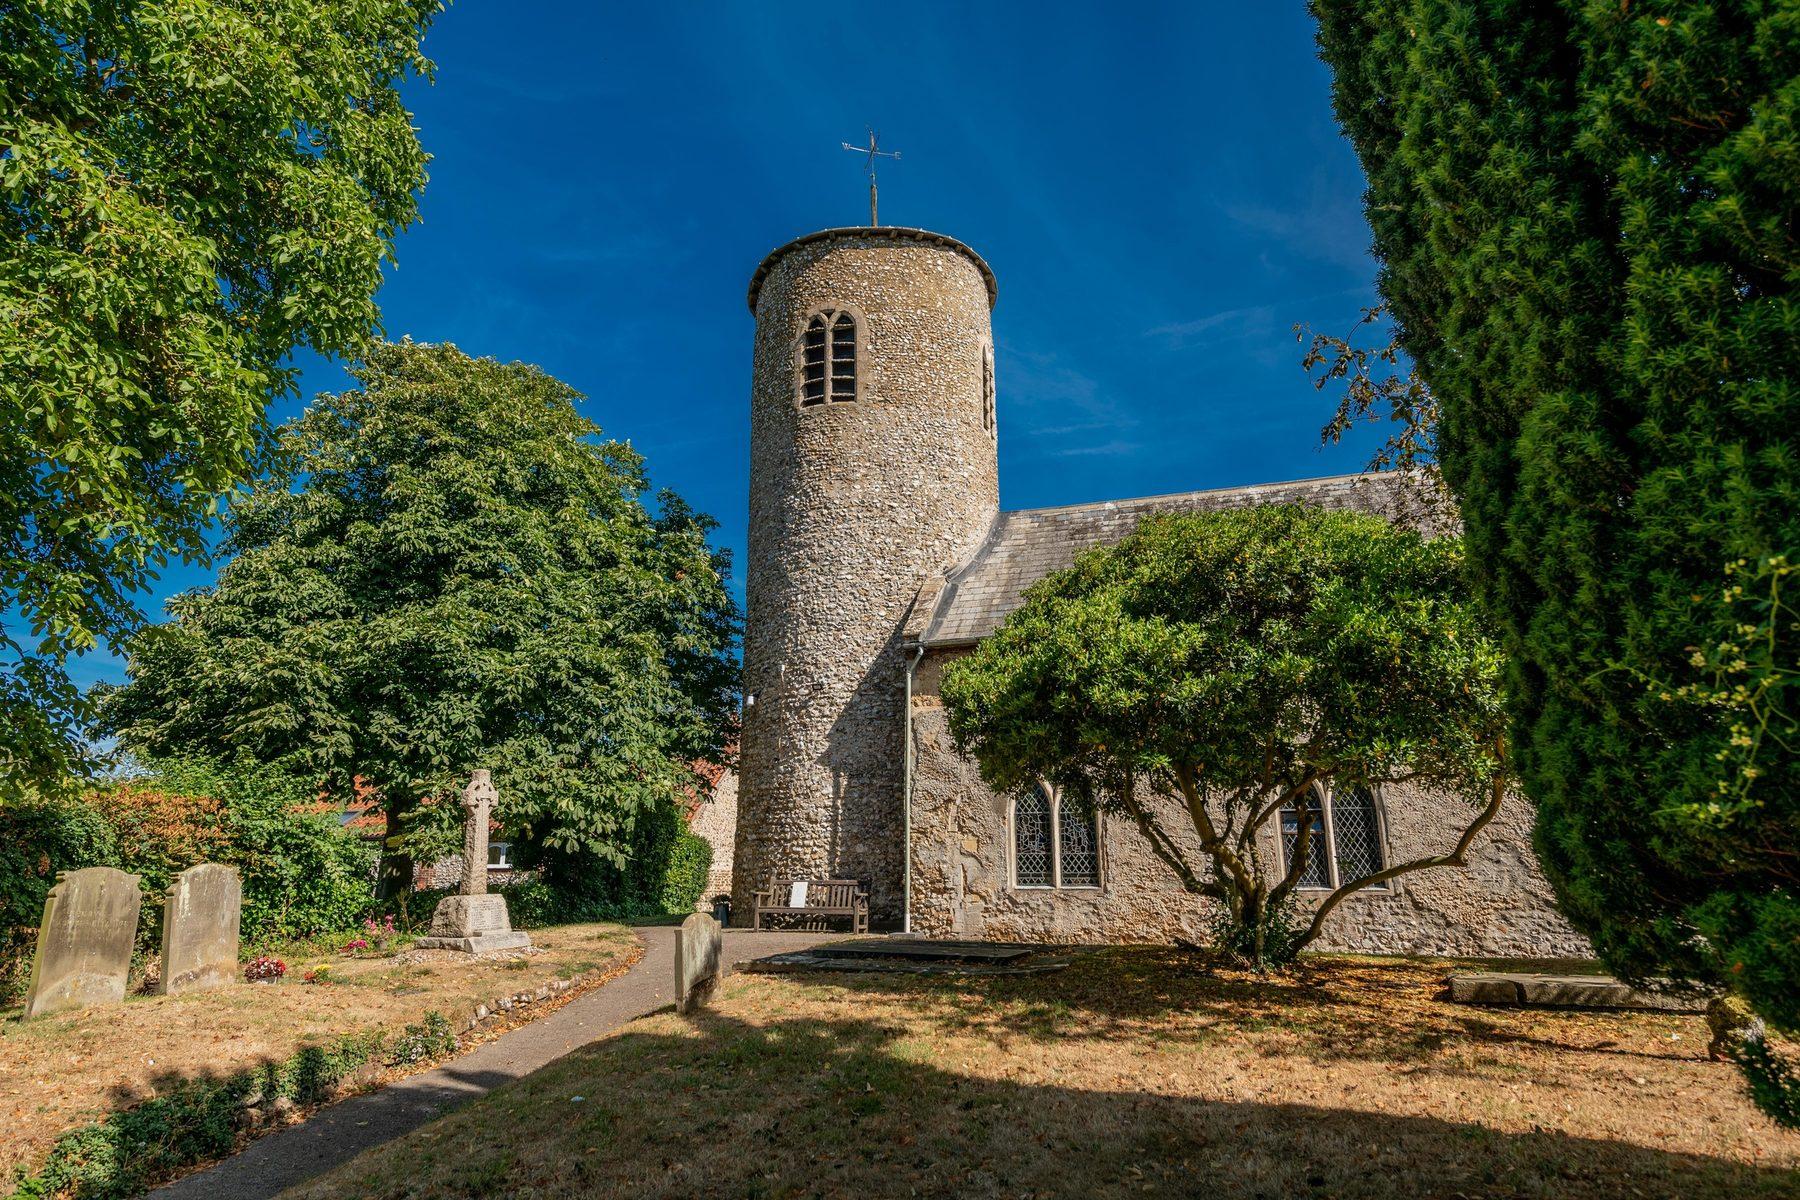 006 Syderstone Church 2018